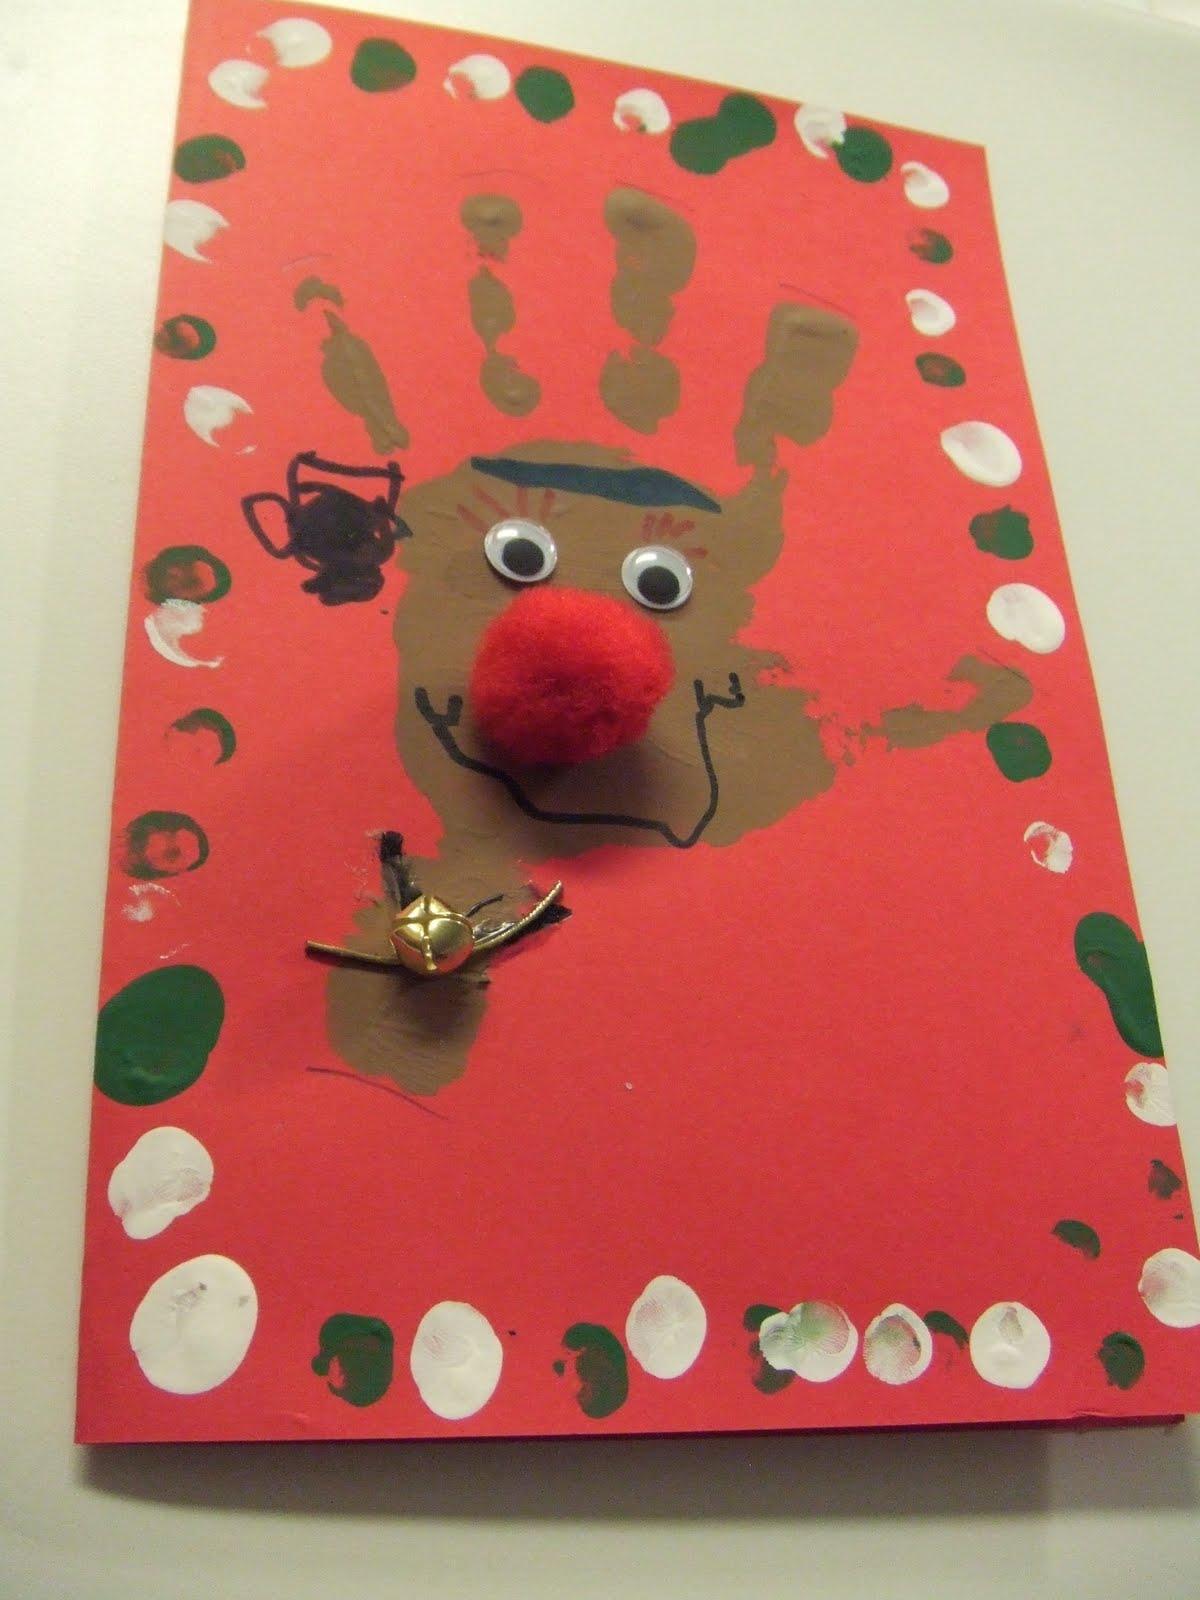 Reindeer Christmas Cards Hand Prints.Tasty Tidbits Creative Crafts And Merry Makings Reindeer